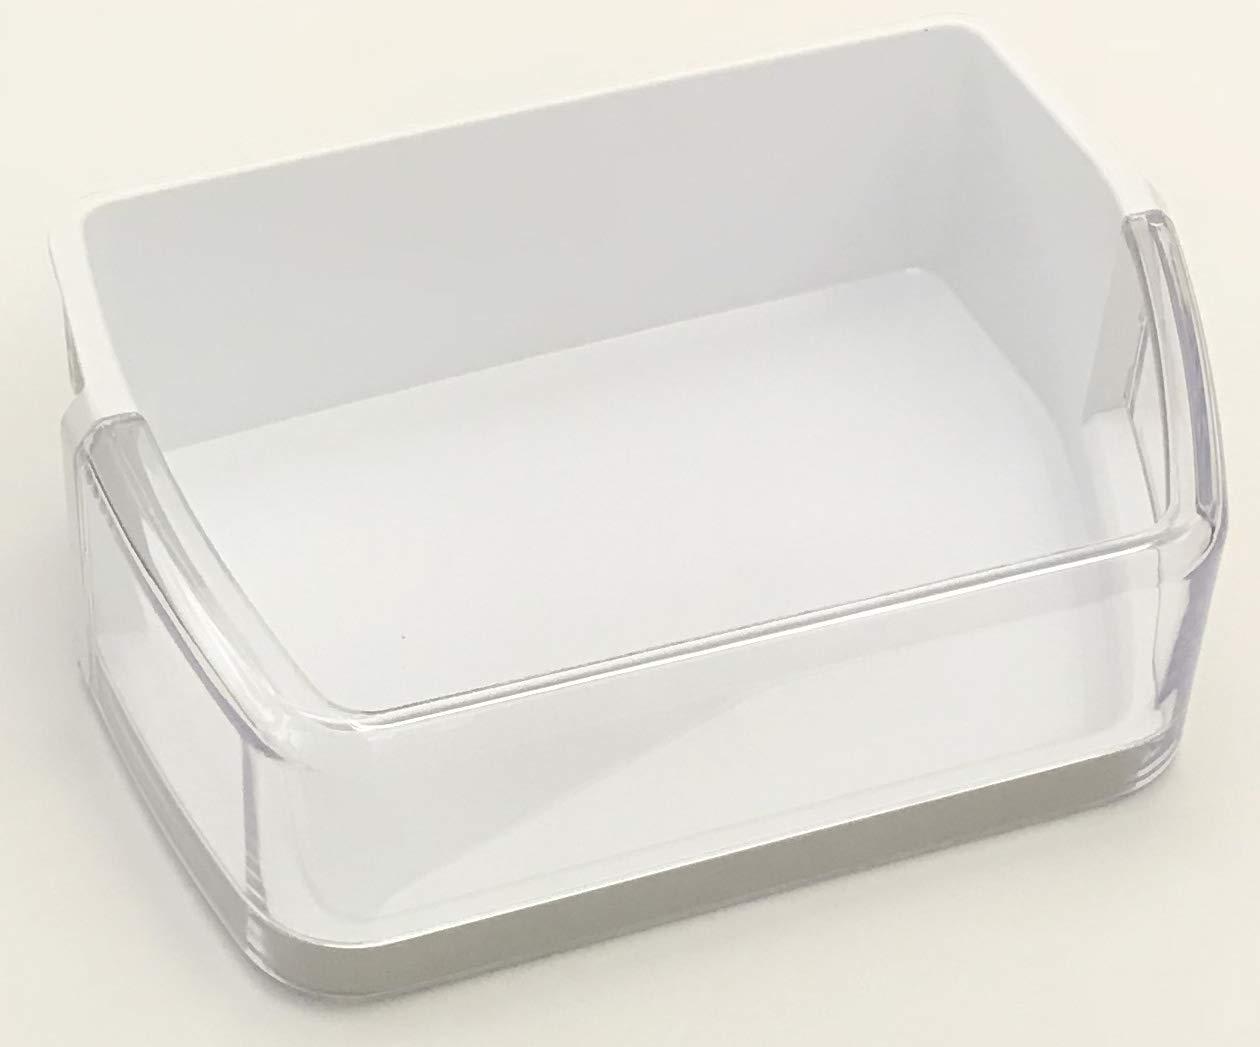 OEM Samsung Refrigerator Door Bin Basket Shelf Tray Specifically For RF25HMEDBSR/AA 0000, RF25HMEDBWW/AA, RF25HMEDBWW/AA 0000